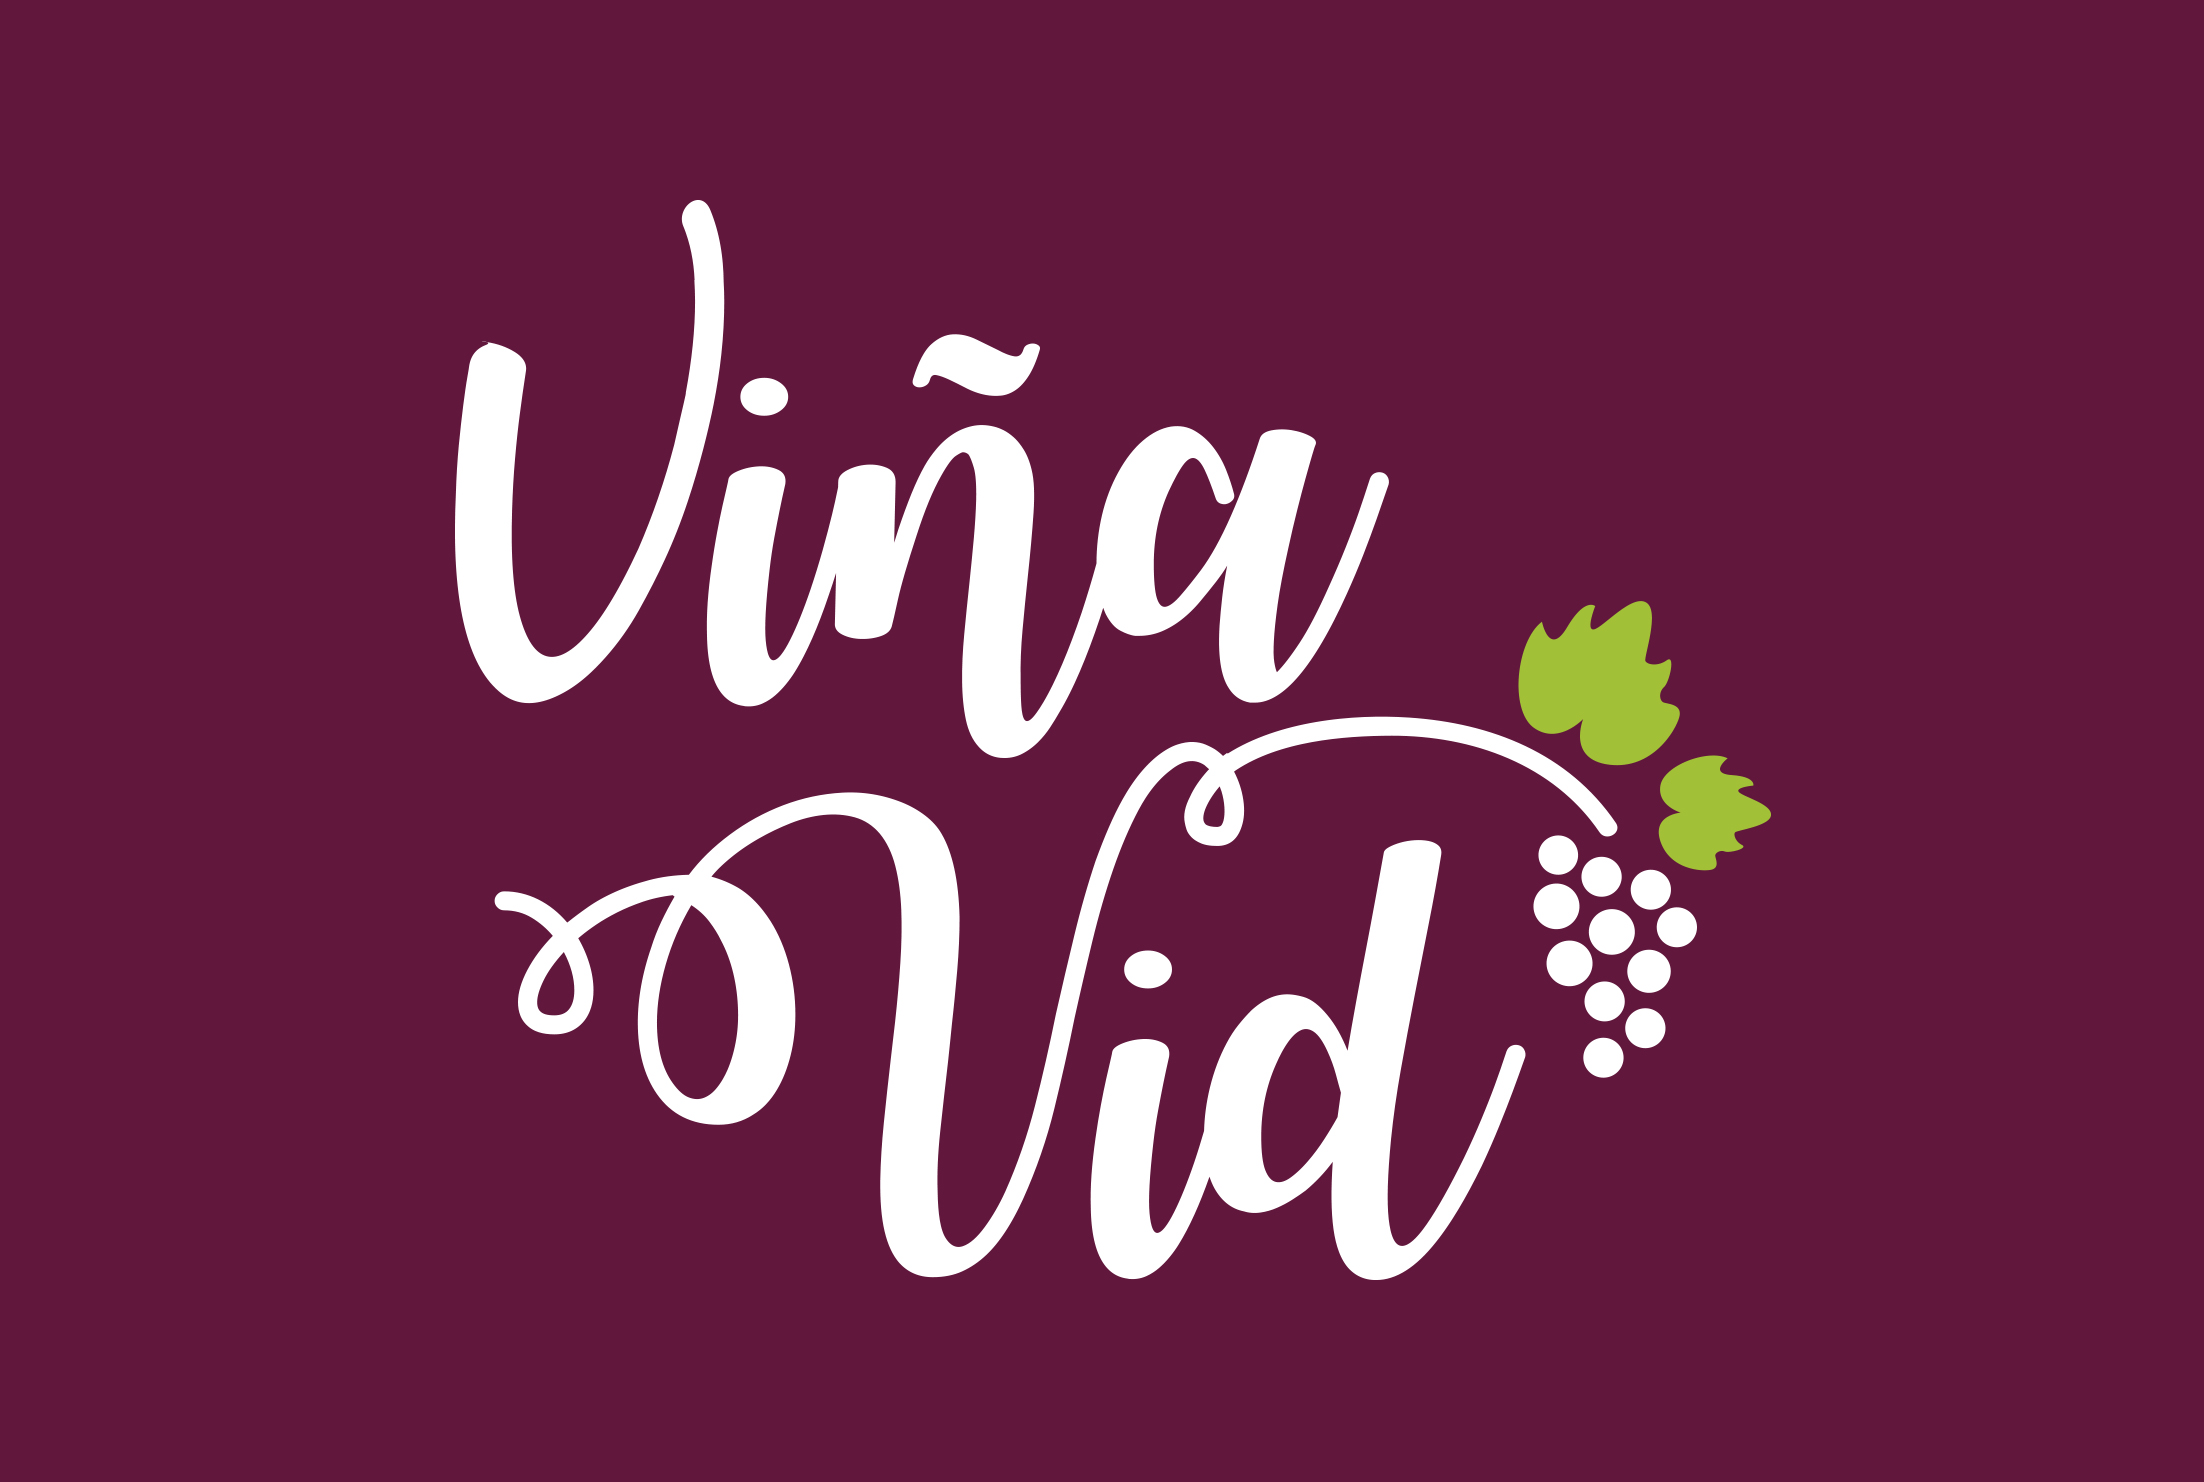 VIÑA VID logotipoa eta txartelak